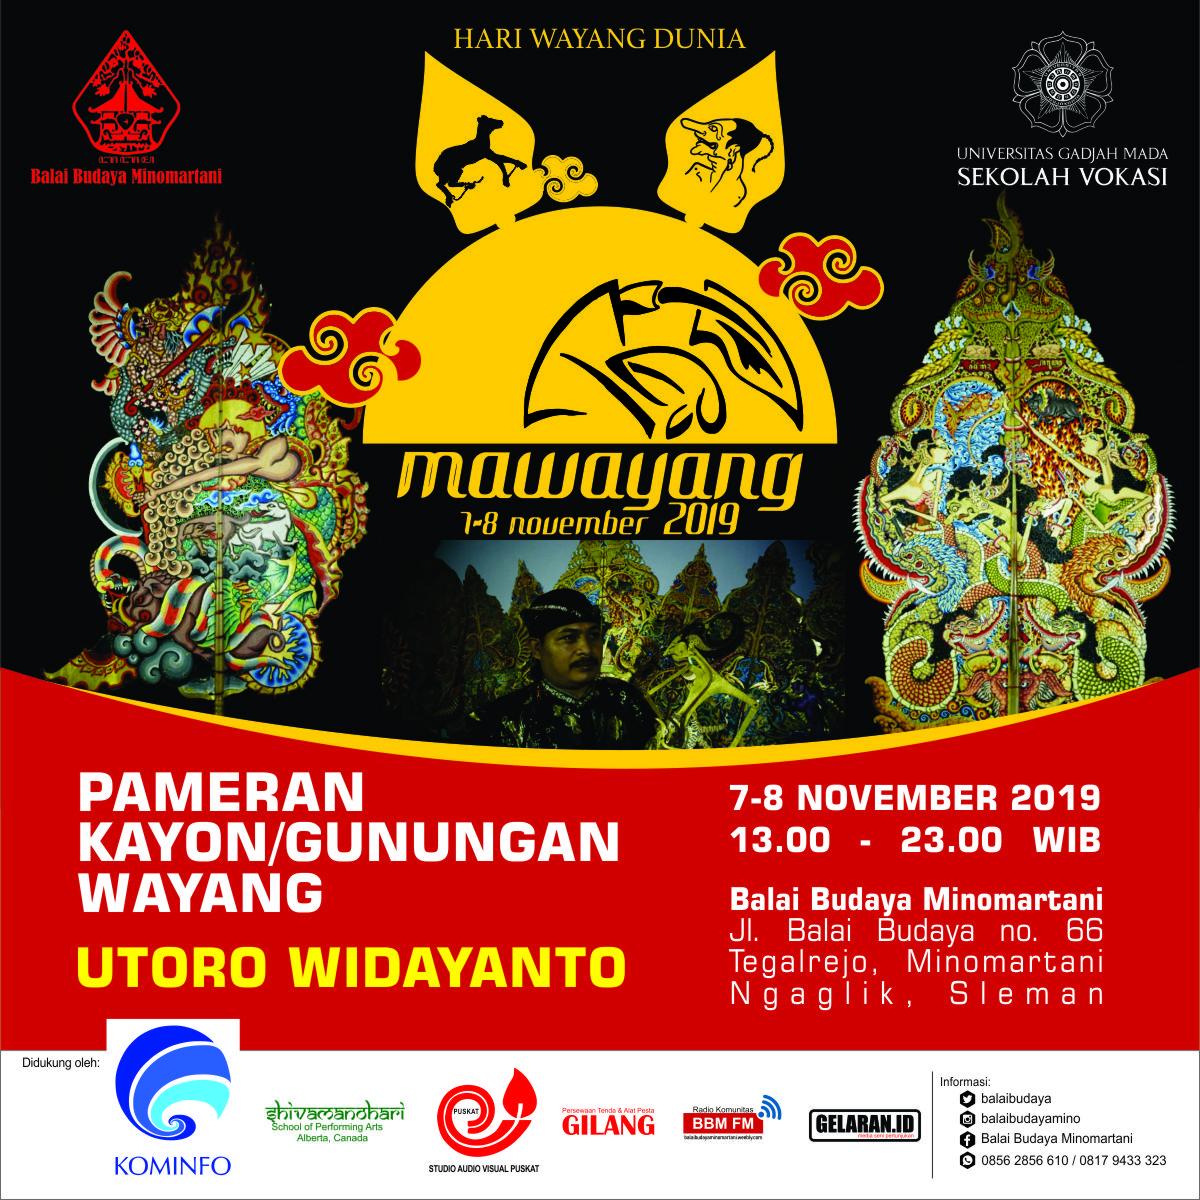 Pameran Kayon MAwayang 2019